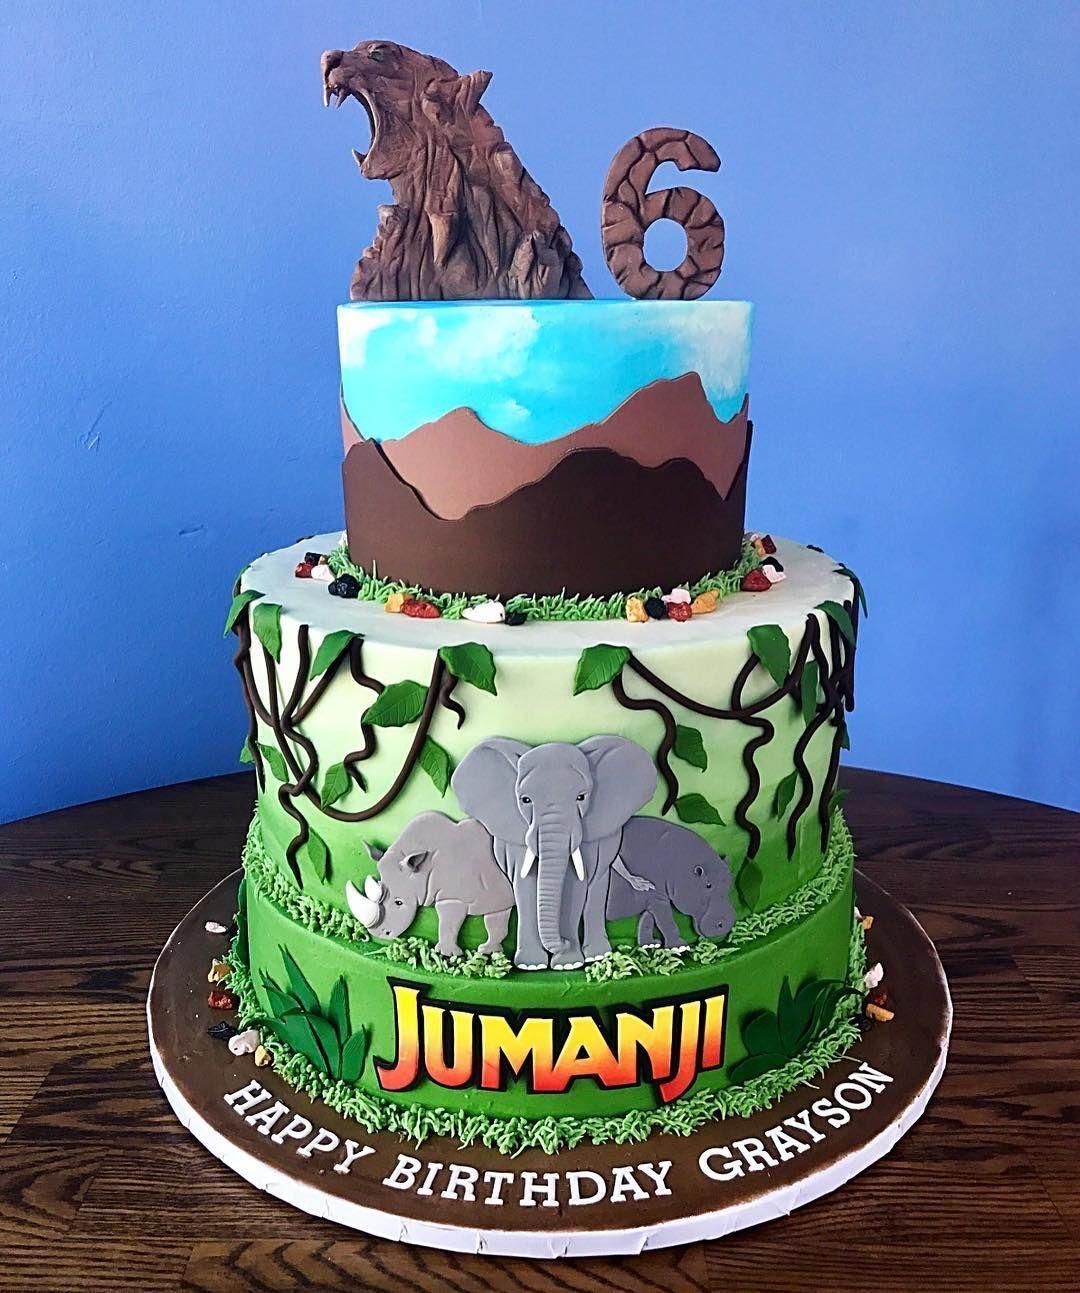 Jumanji Birthday Cake Google Search Birthday Party Cake Wild Kratts Birthday Party Cake